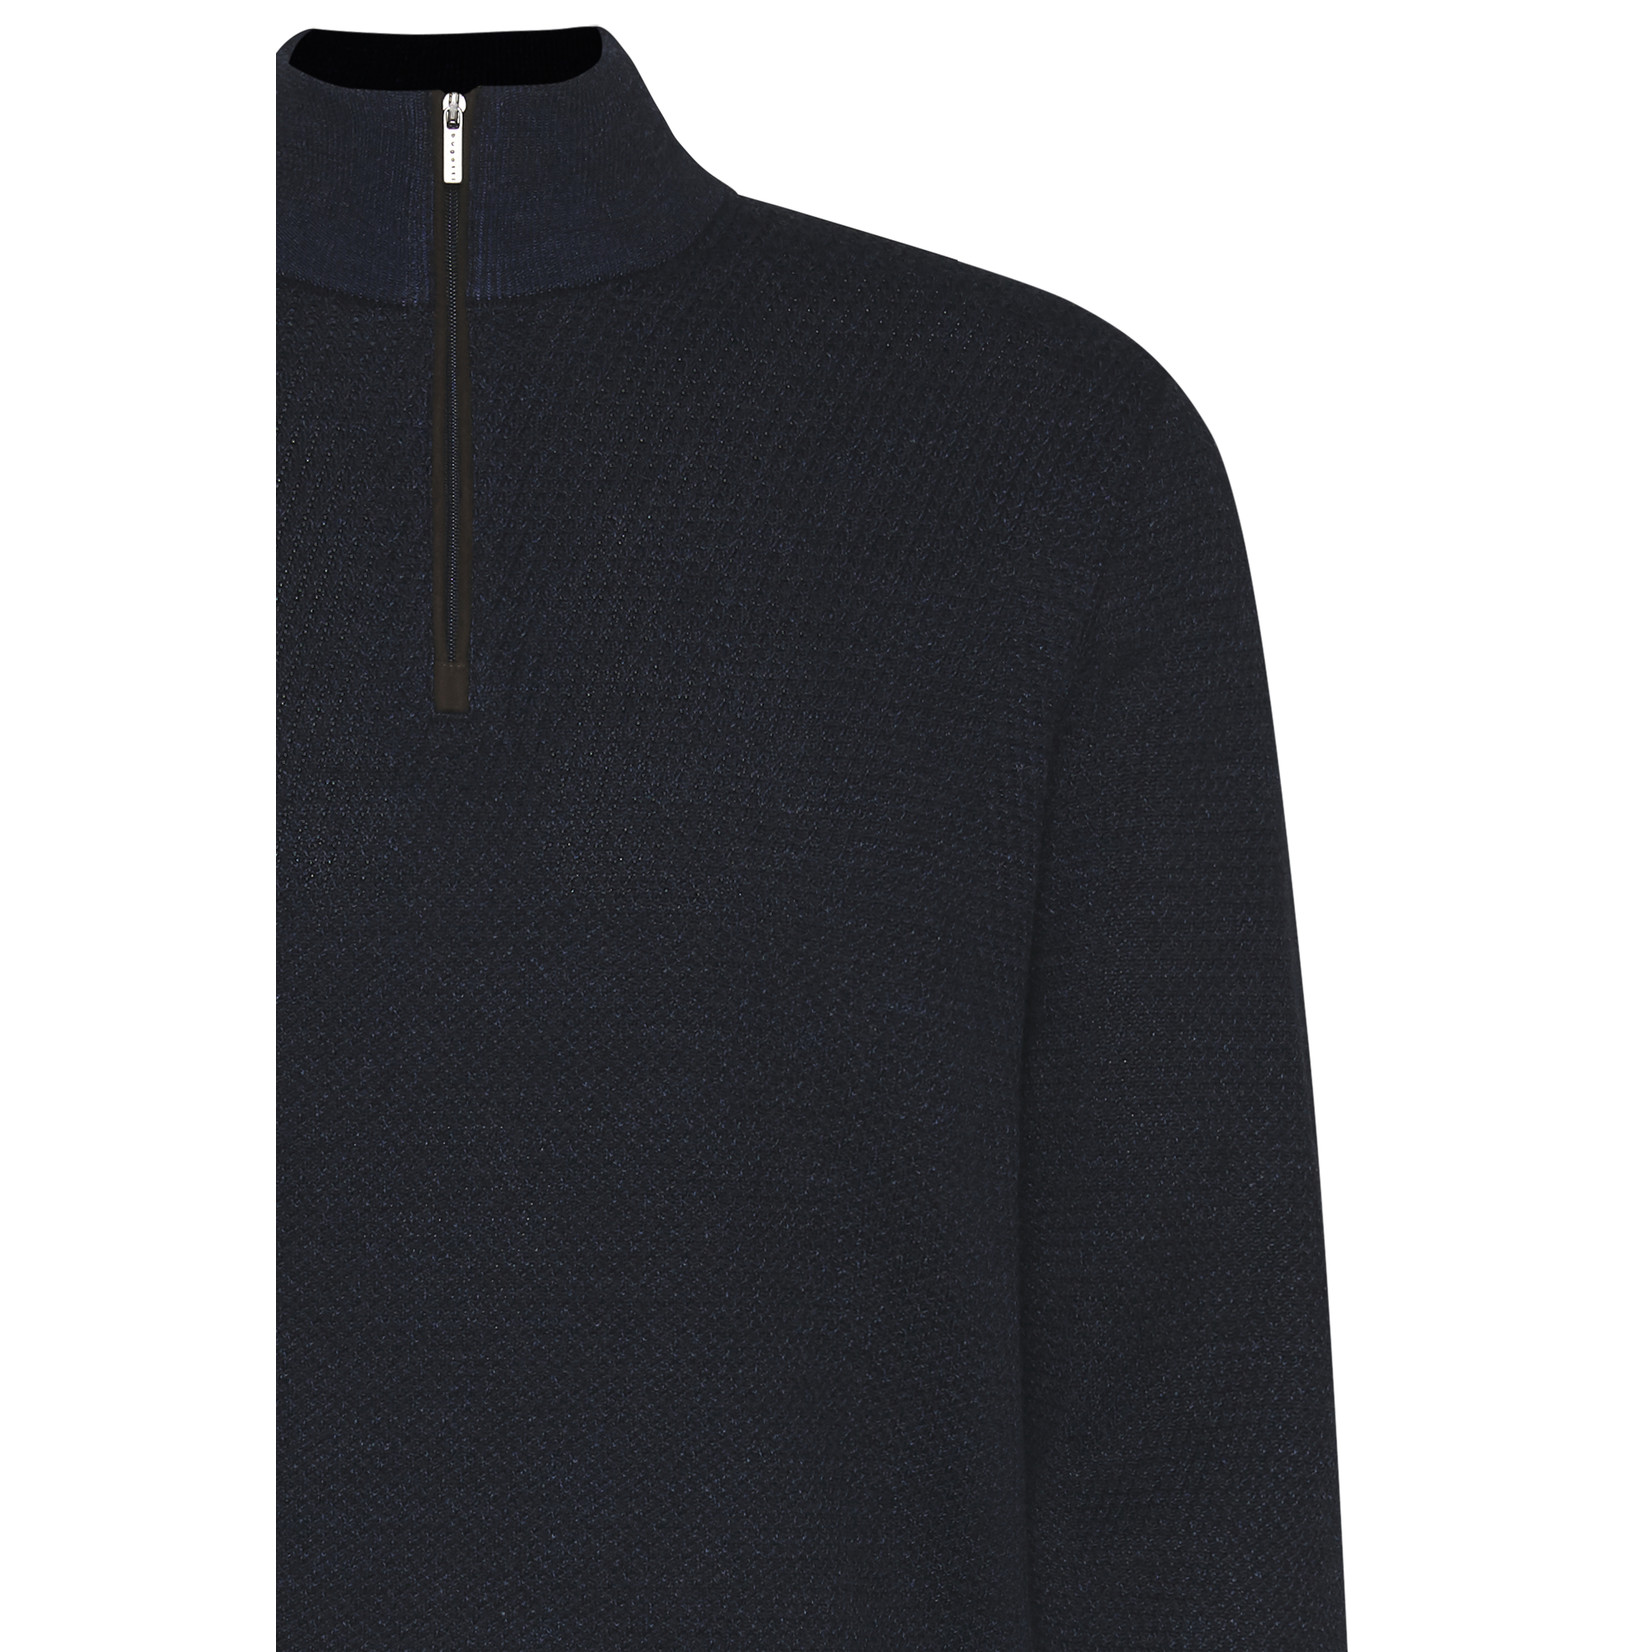 Bugatti trui met korte rits jeansblauw